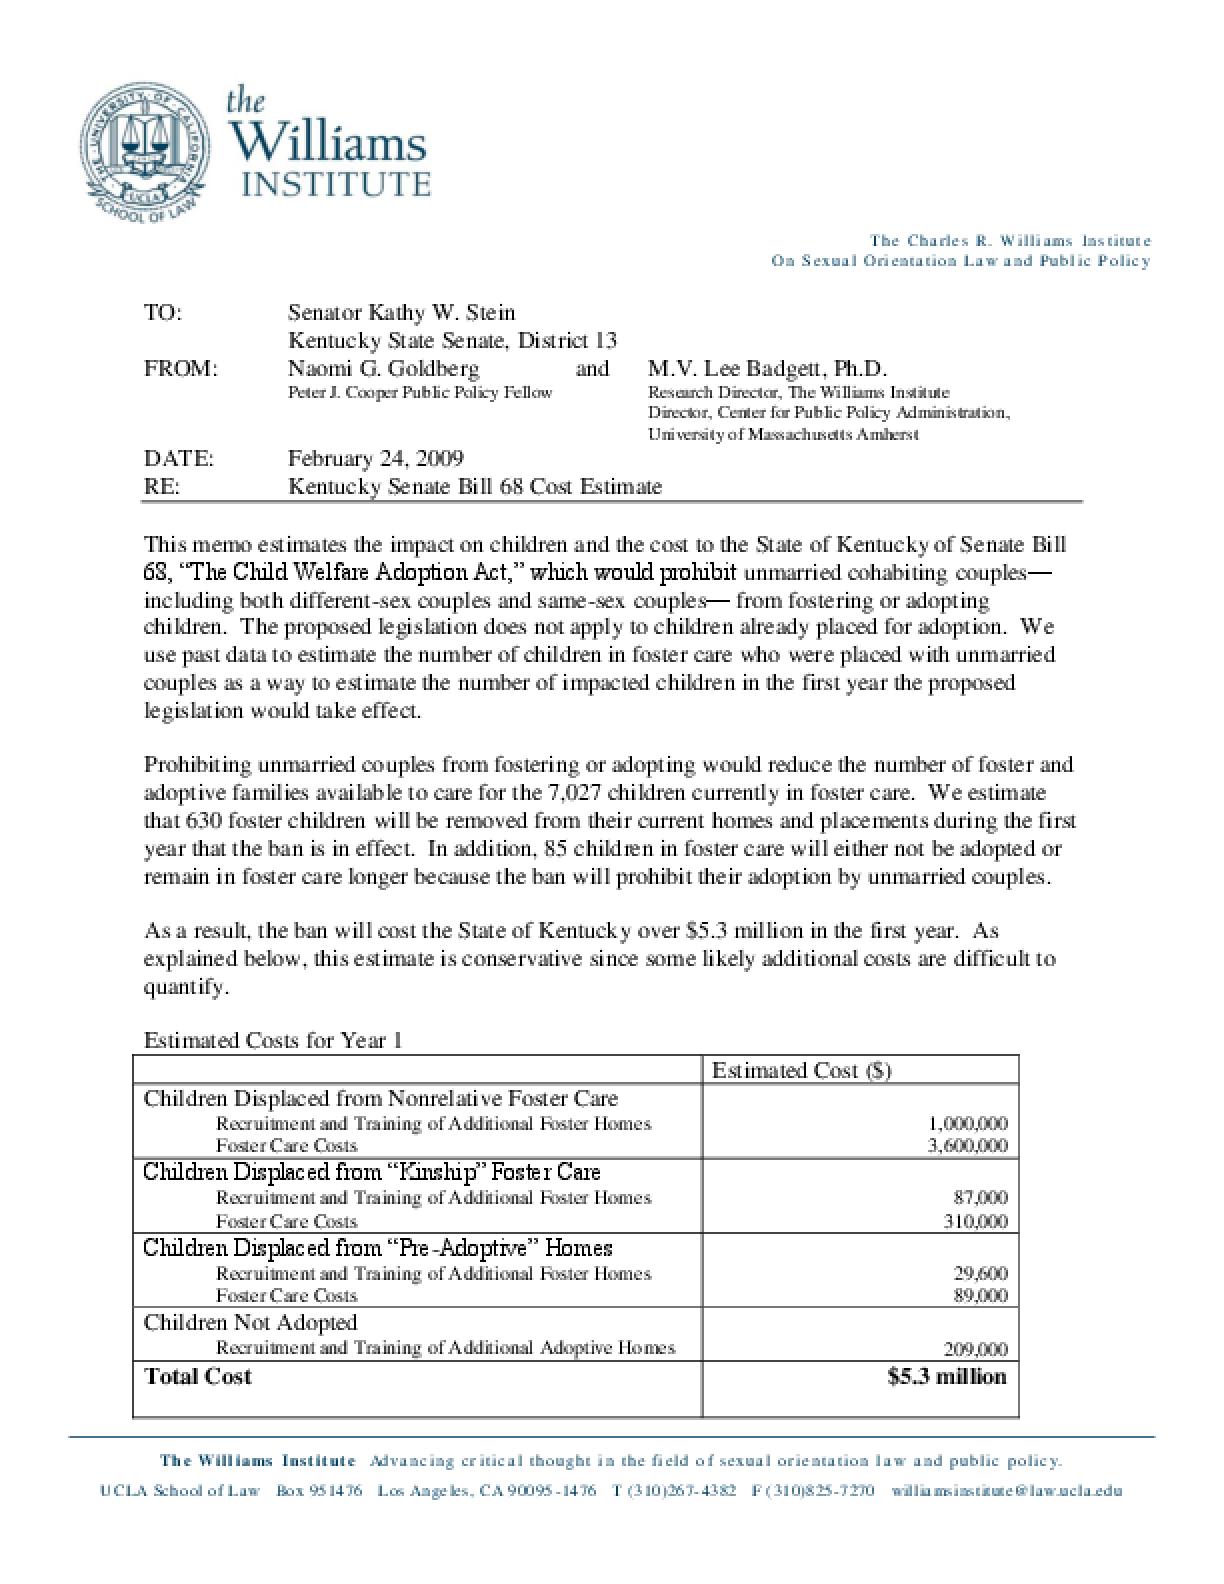 Kentucky Foster Care/Adoption Ban Cost Estimate